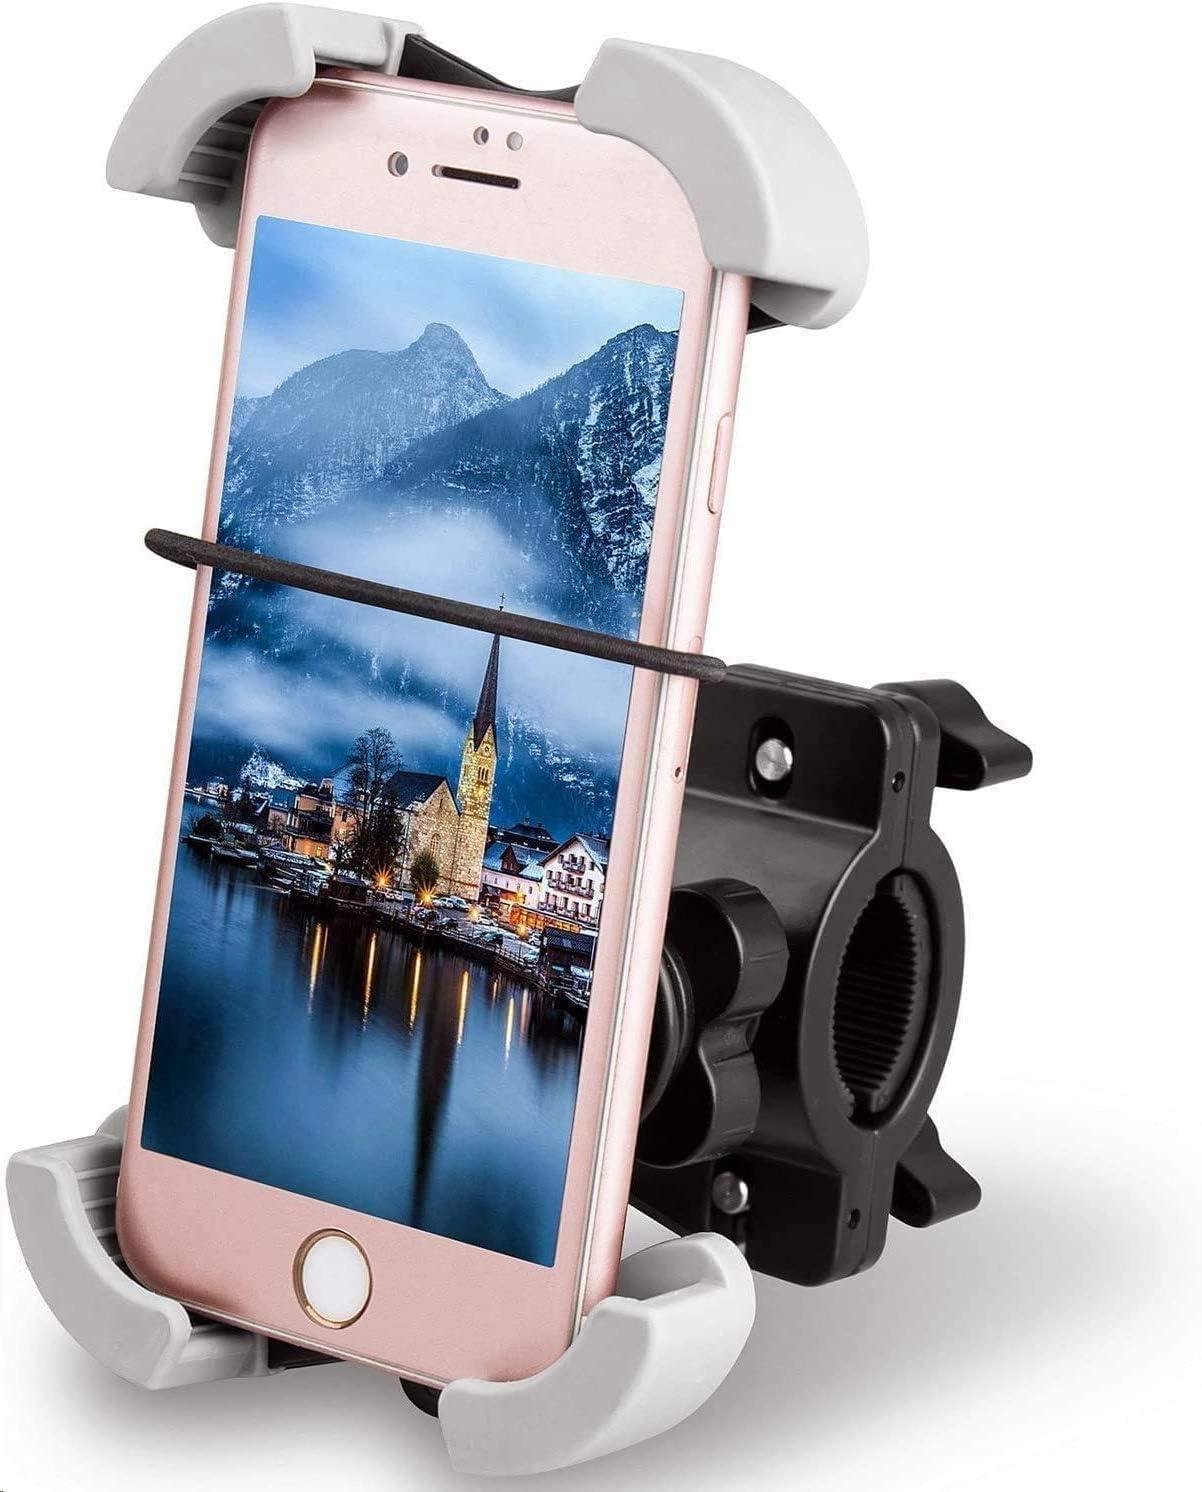 Quntis Bike Phone Mount Adjustable Max 82% OFF Max 44% OFF Motorcycle Rotation 360°